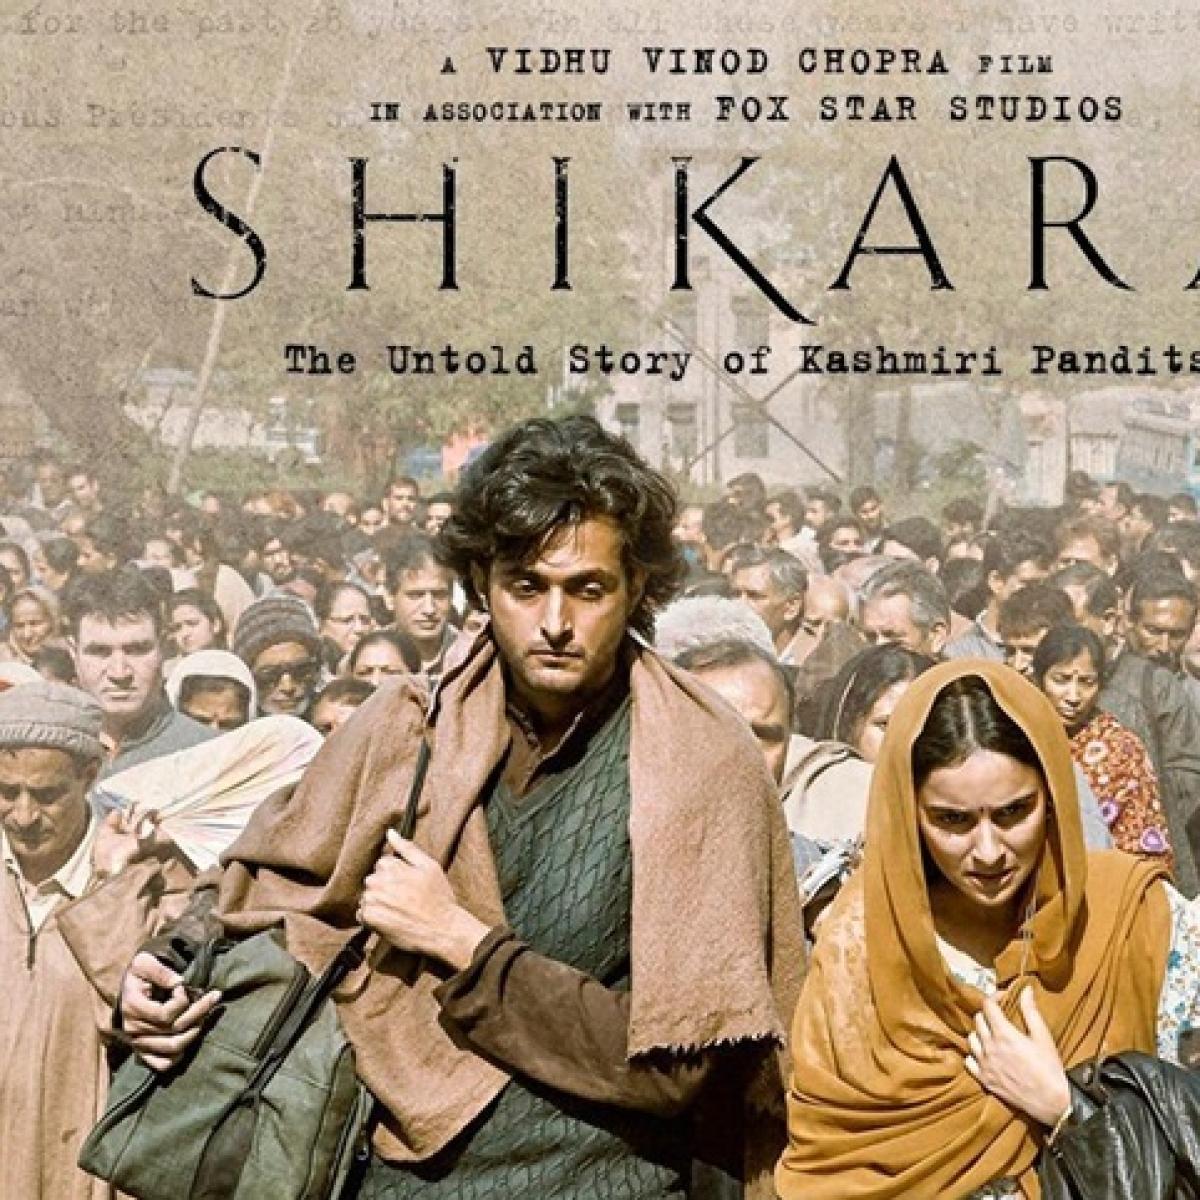 Shikara Trailer: Story of Kashmiri Pandits unfolds 30 years later